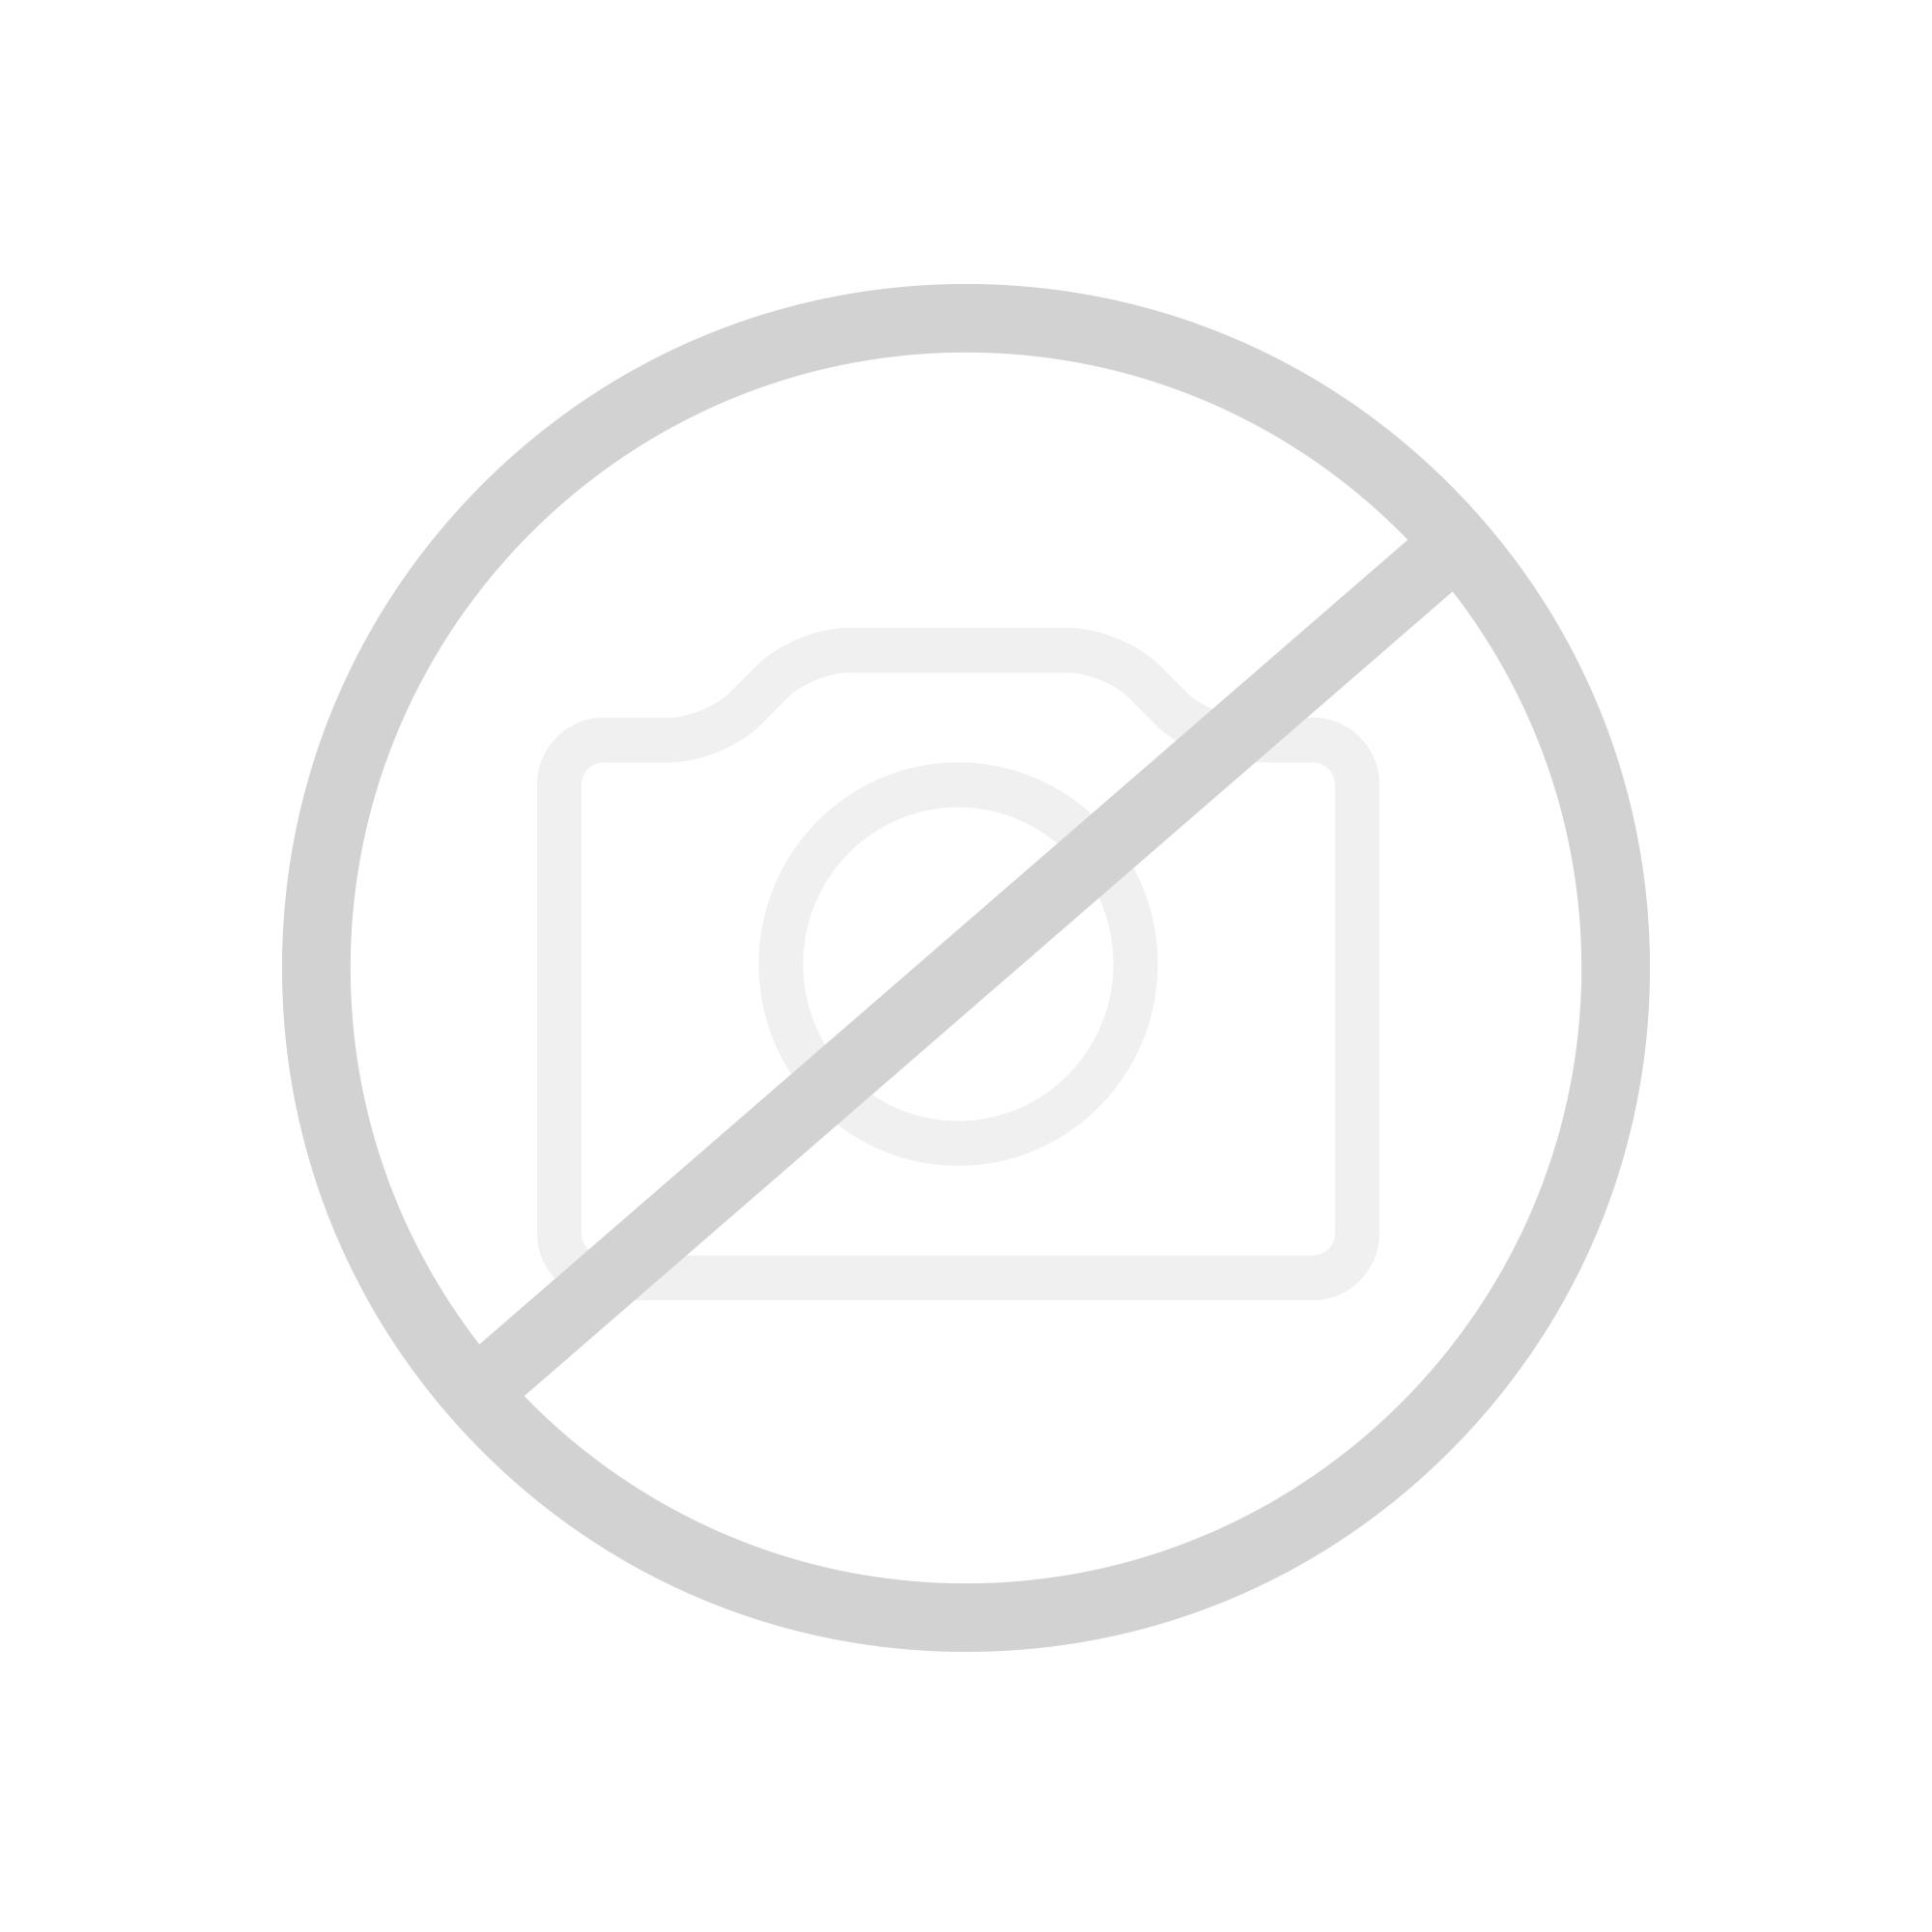 HSK ASP Softcube Spiegel Hochschrank Anschlag links